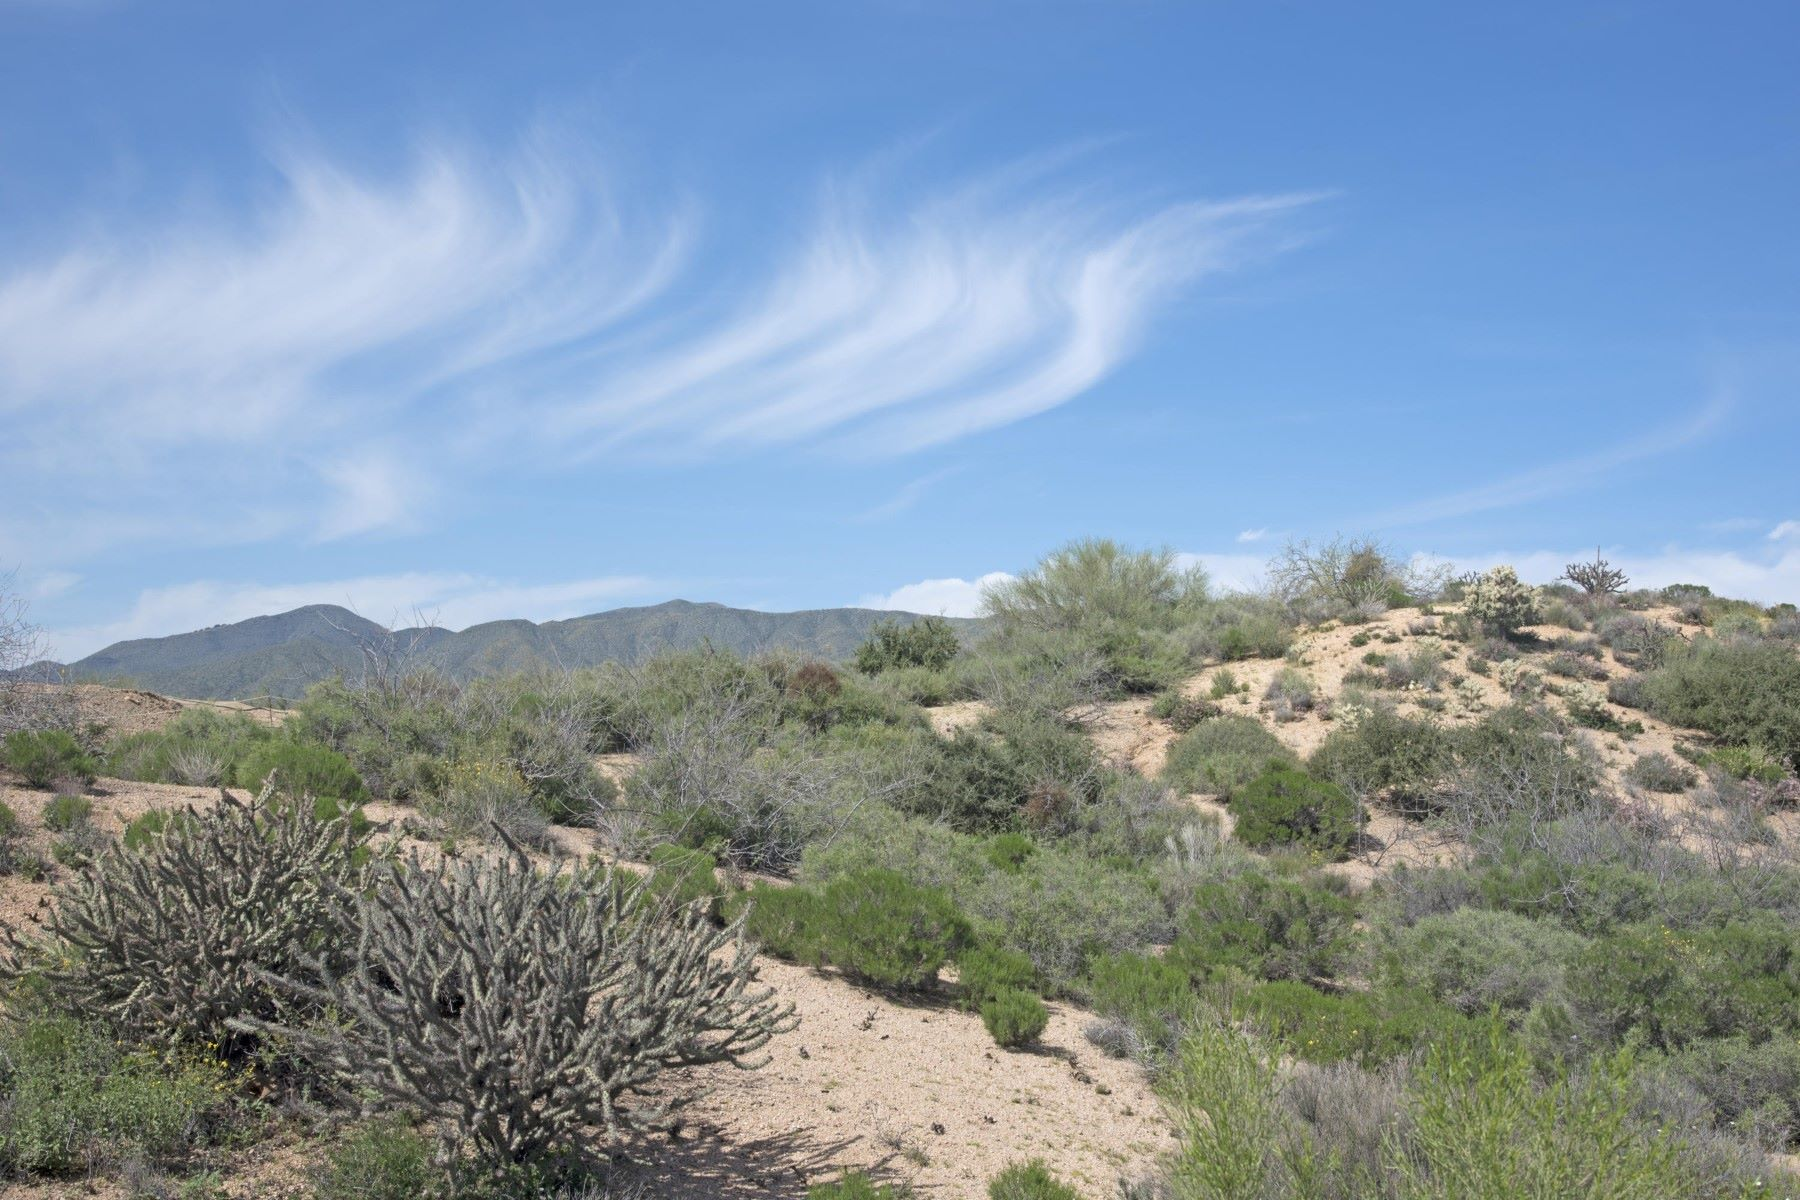 Terreno por un Venta en Prestigious Hillside lot with abundance of views 10954 E Santa Fe Trl #19 Scottsdale, Arizona, 85262 Estados Unidos